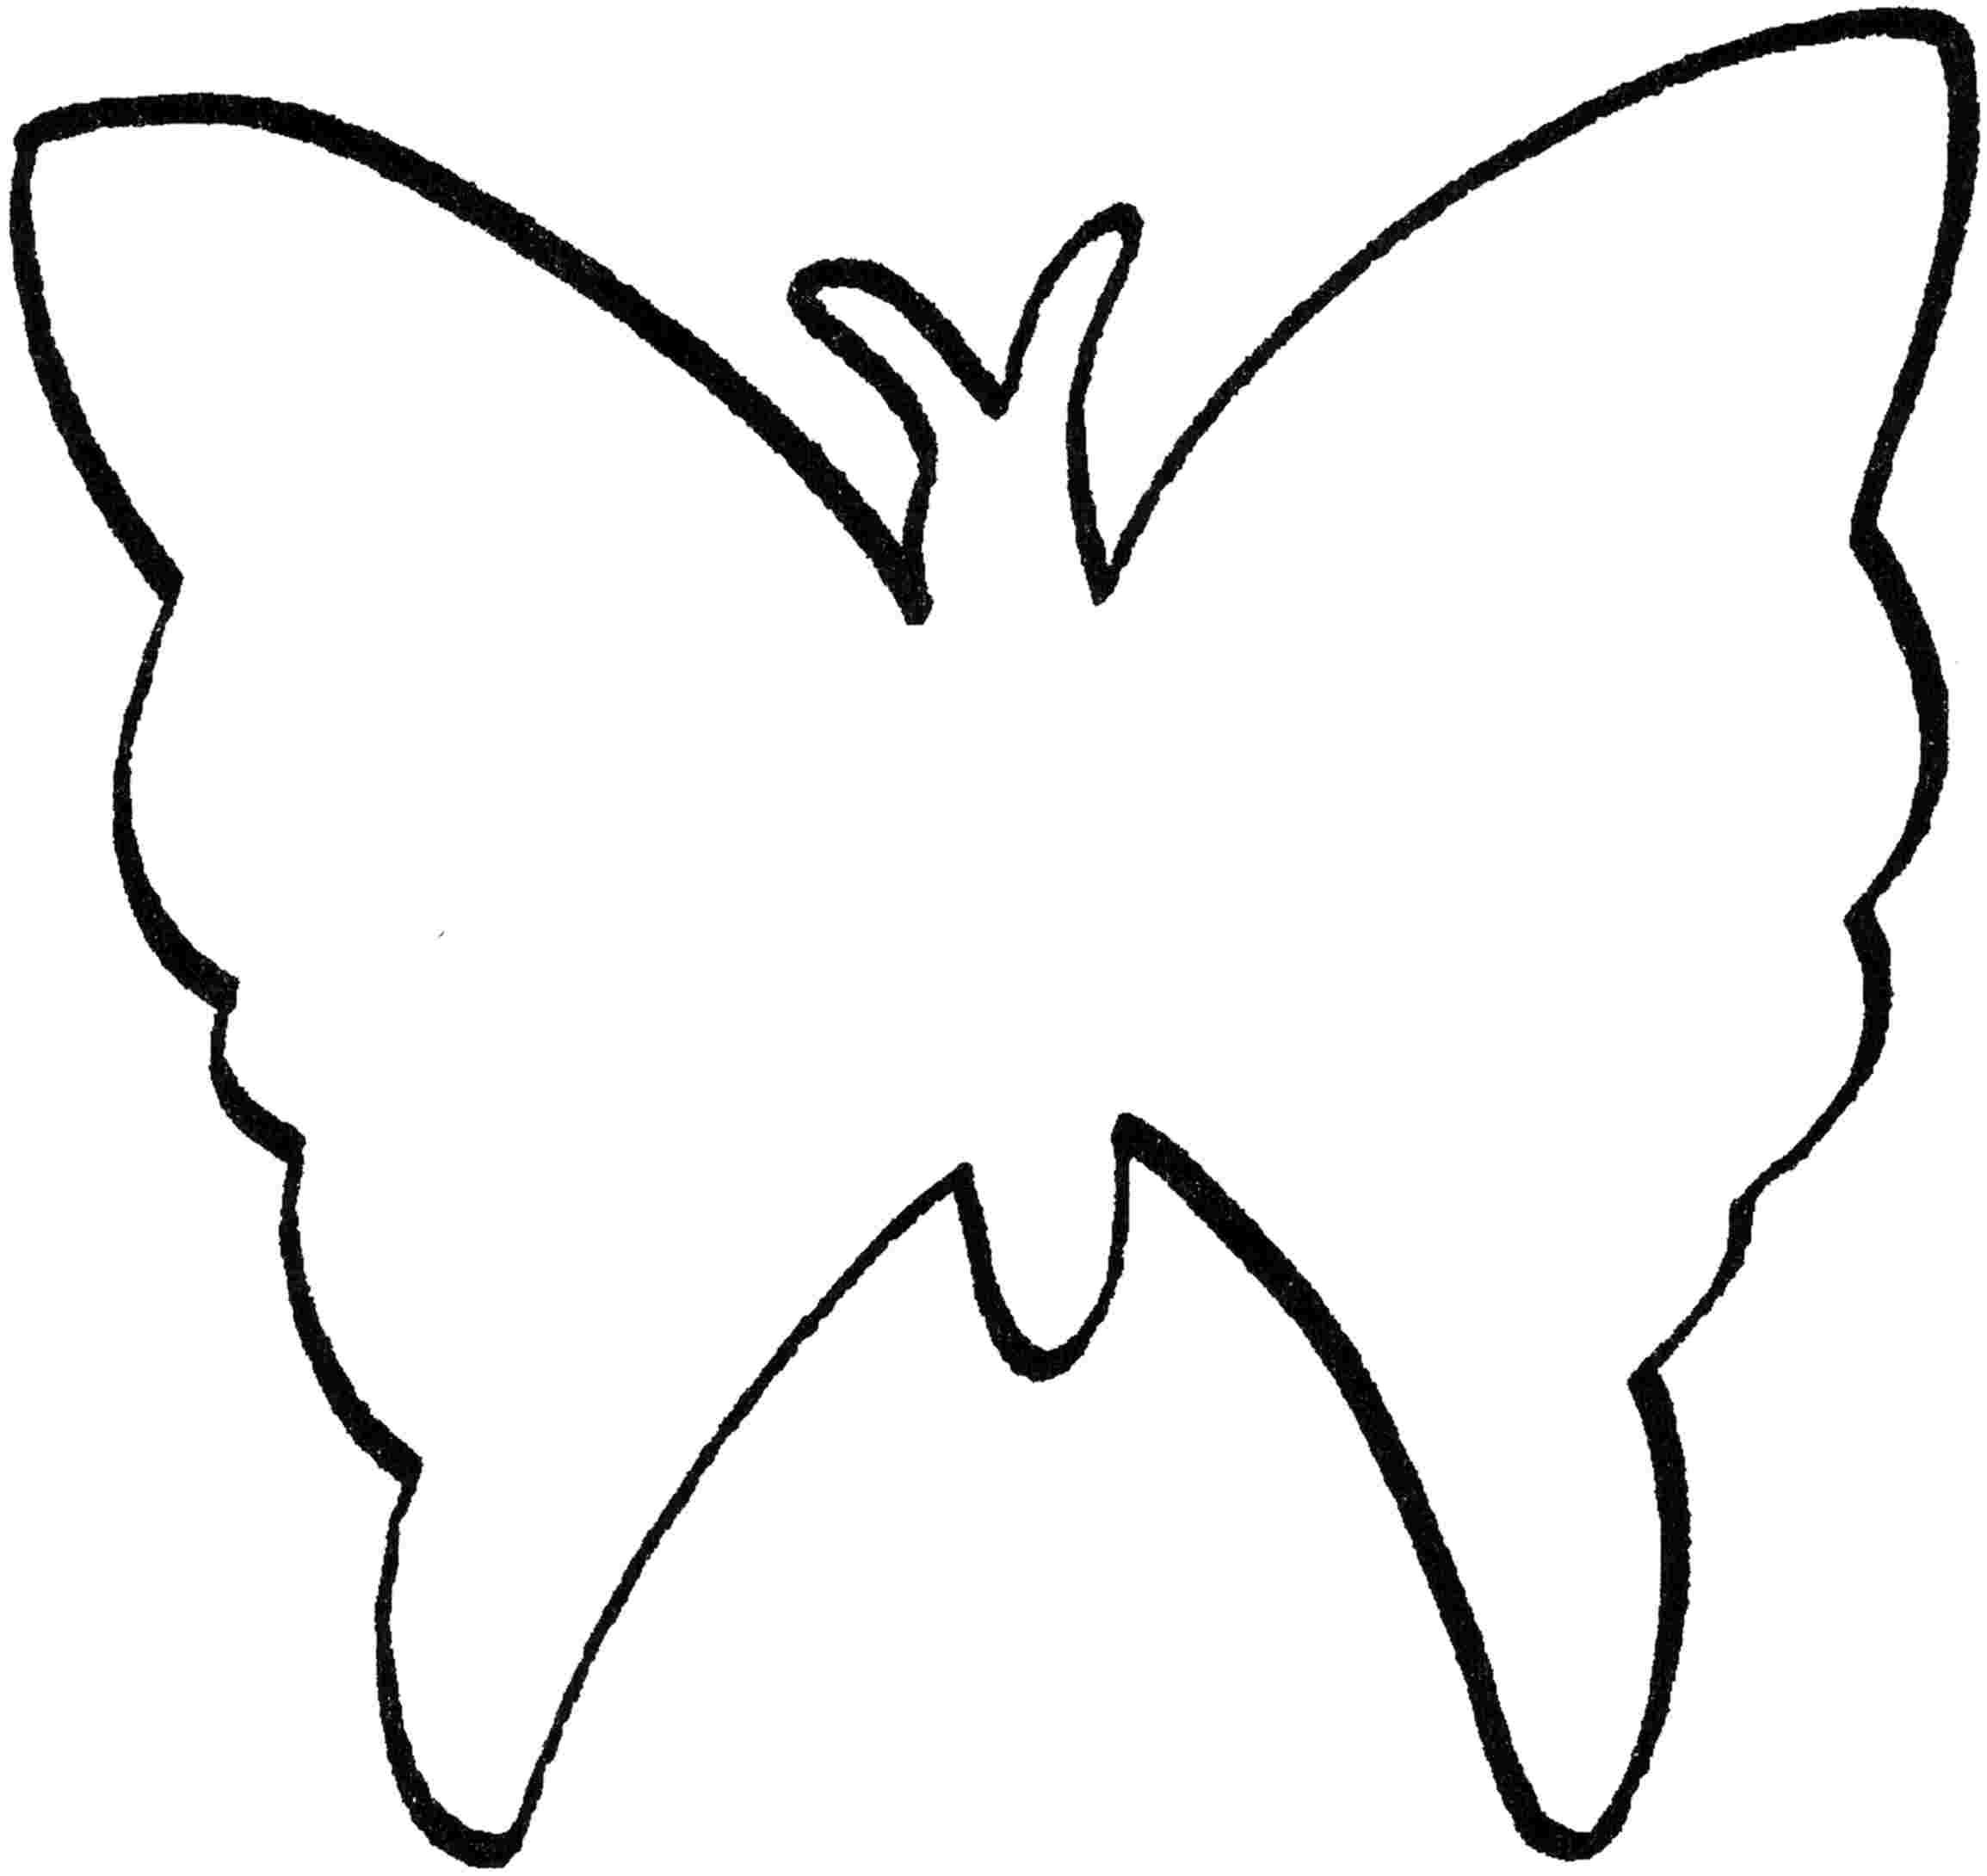 Раскраски бабочки раскраска бабочка для малышей - раскраски онлайн